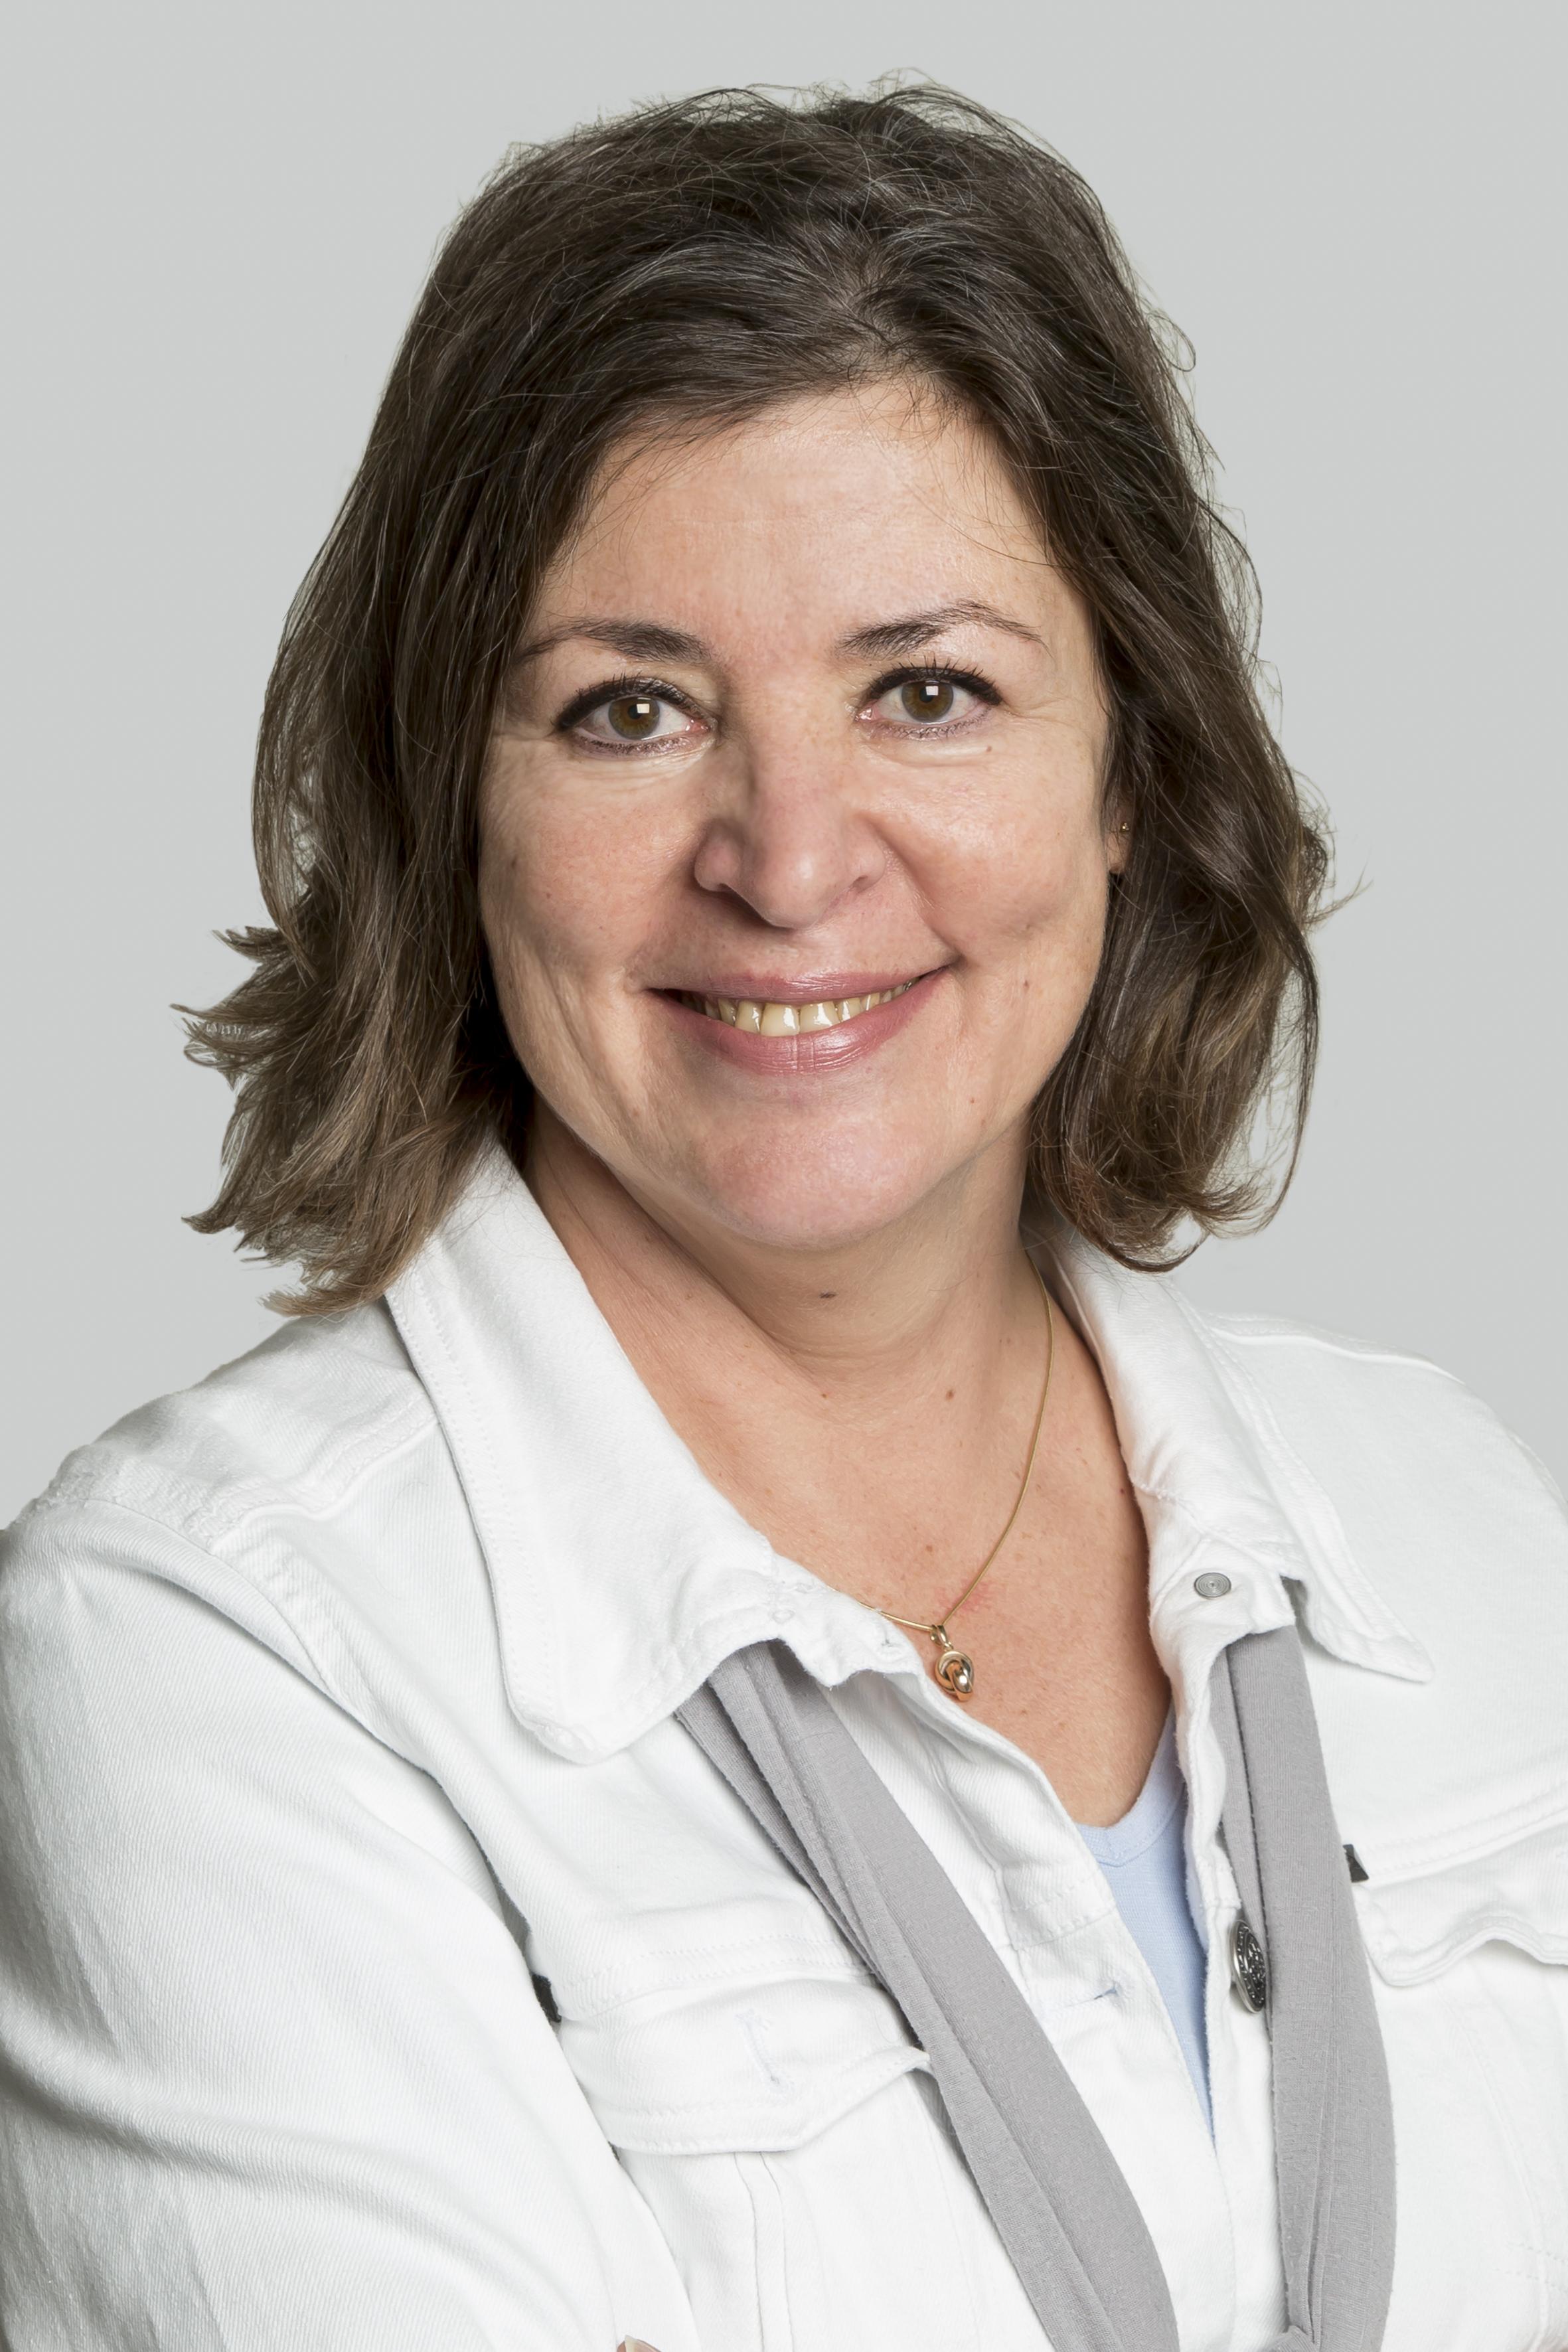 Orthomoleculair voedingscoach Lynn Hogendoorn